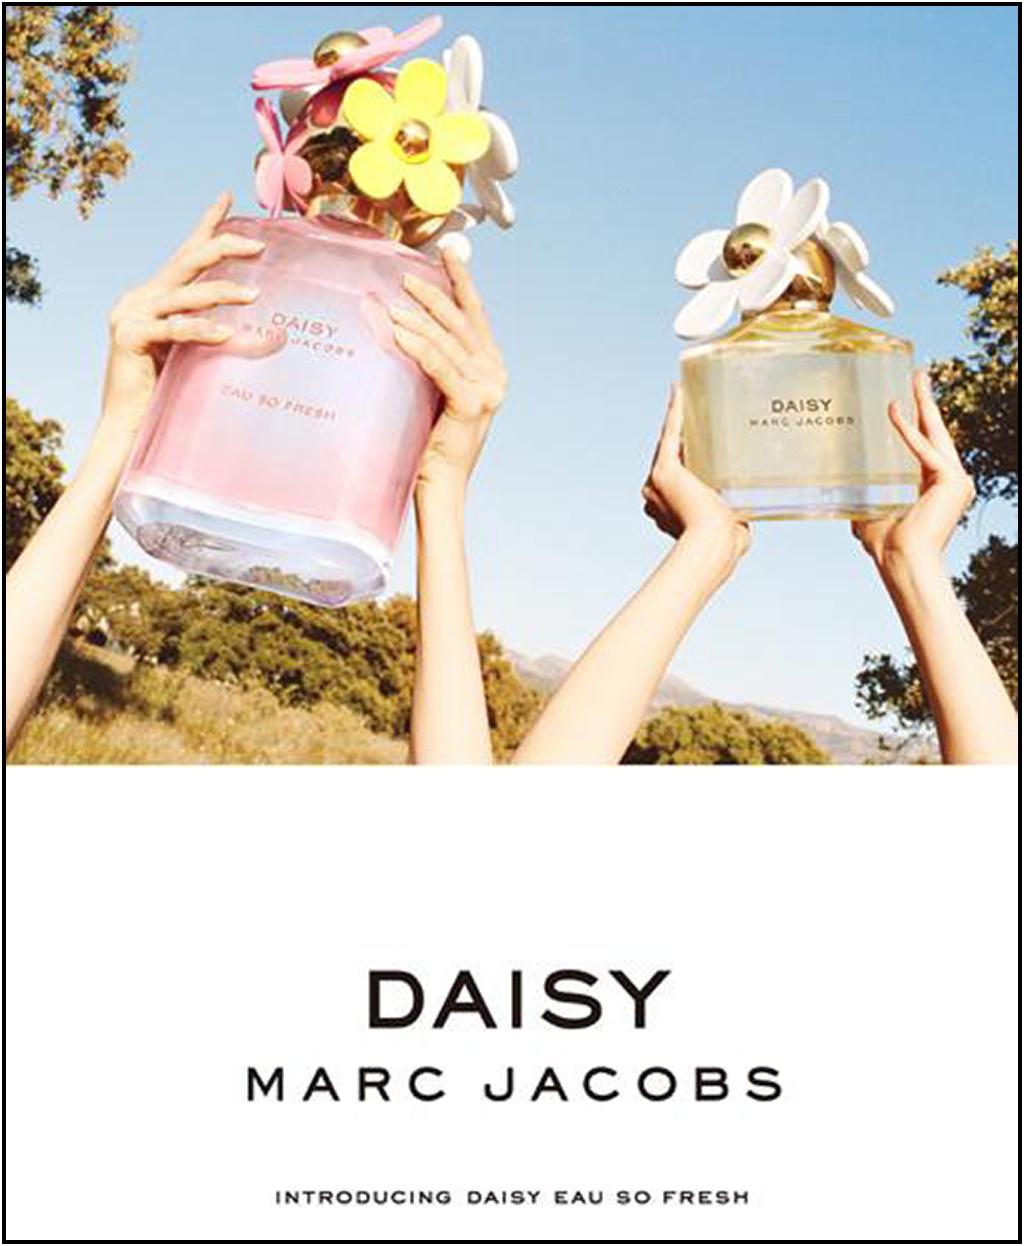 perfume shrine marc jacobs daisy eau so fresh fragrance. Black Bedroom Furniture Sets. Home Design Ideas